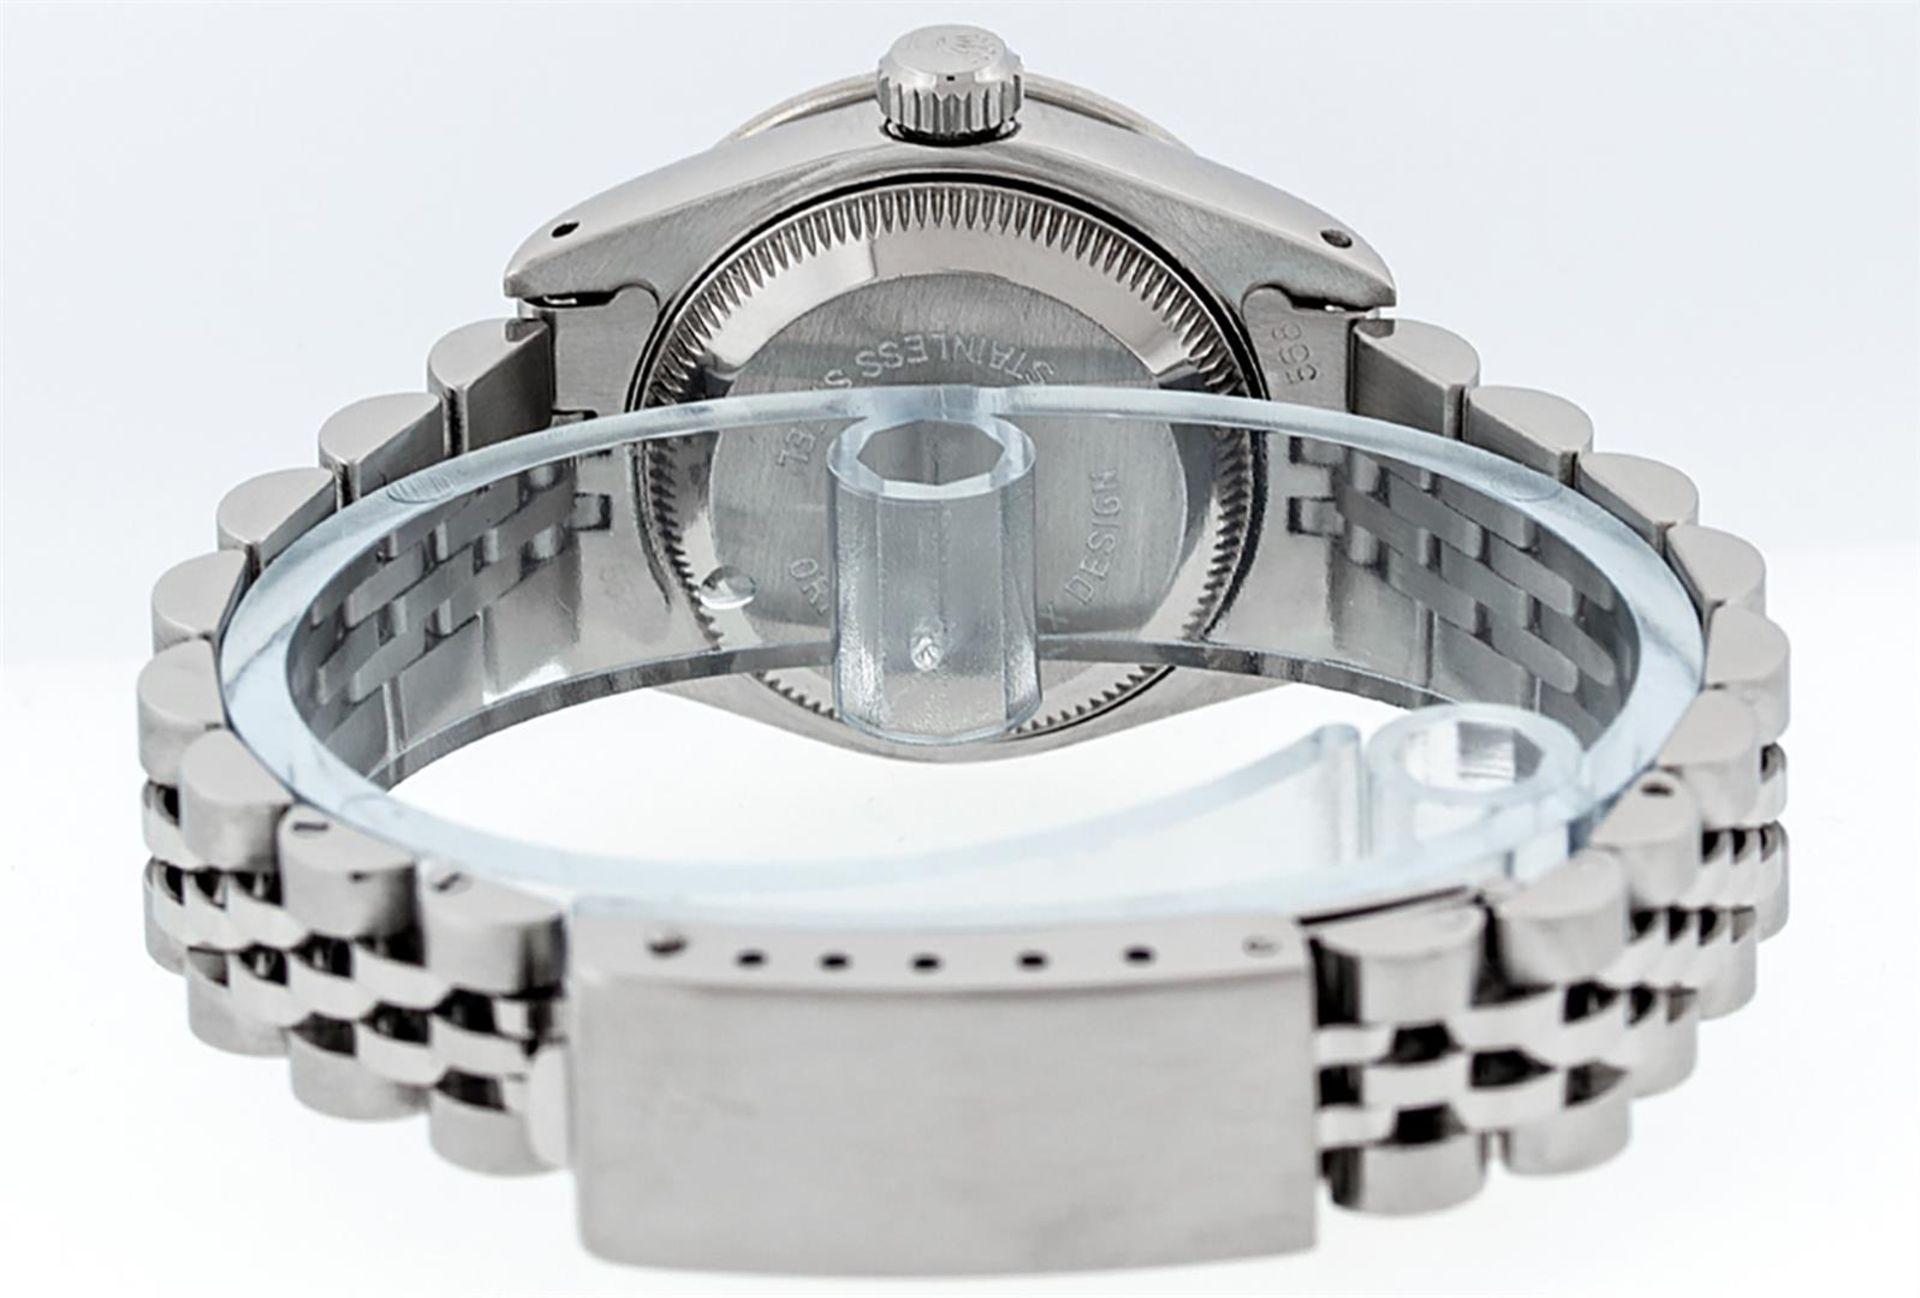 Rolex Ladies Stainless Steel 26MM Orange String Diamond Lugs Datejust Wristwatch - Image 9 of 9